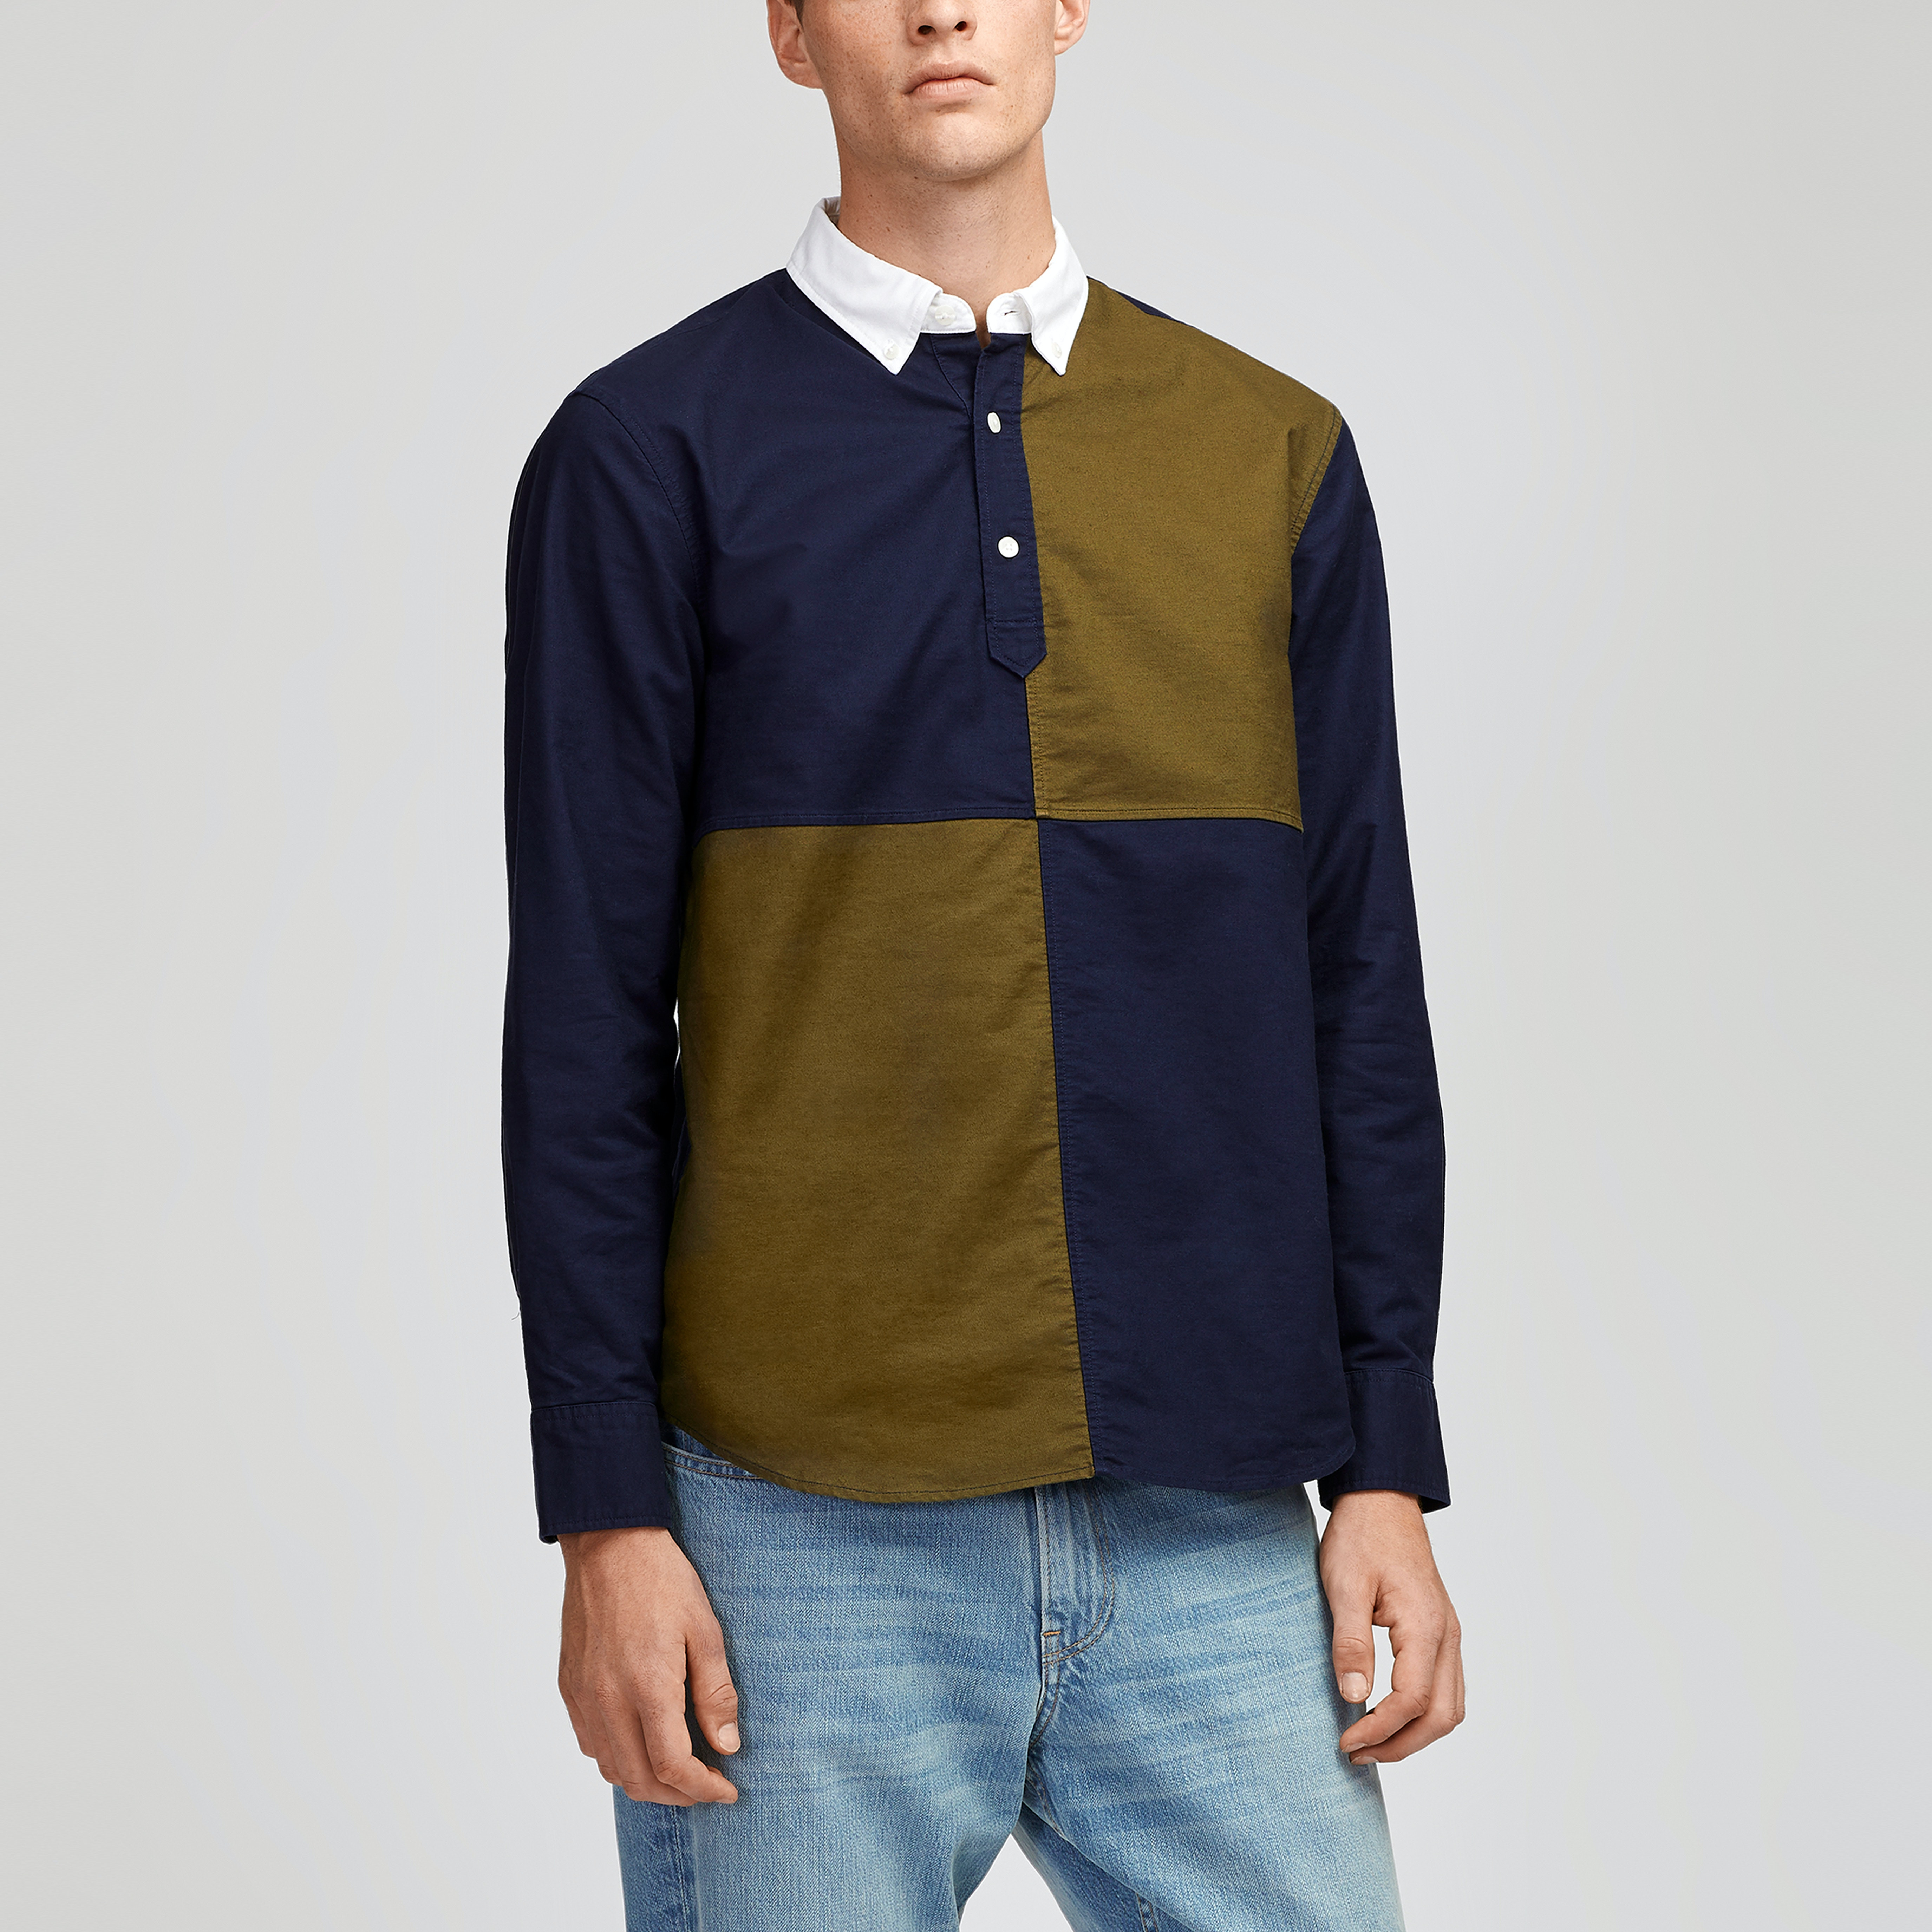 Fall Novelty Shirts